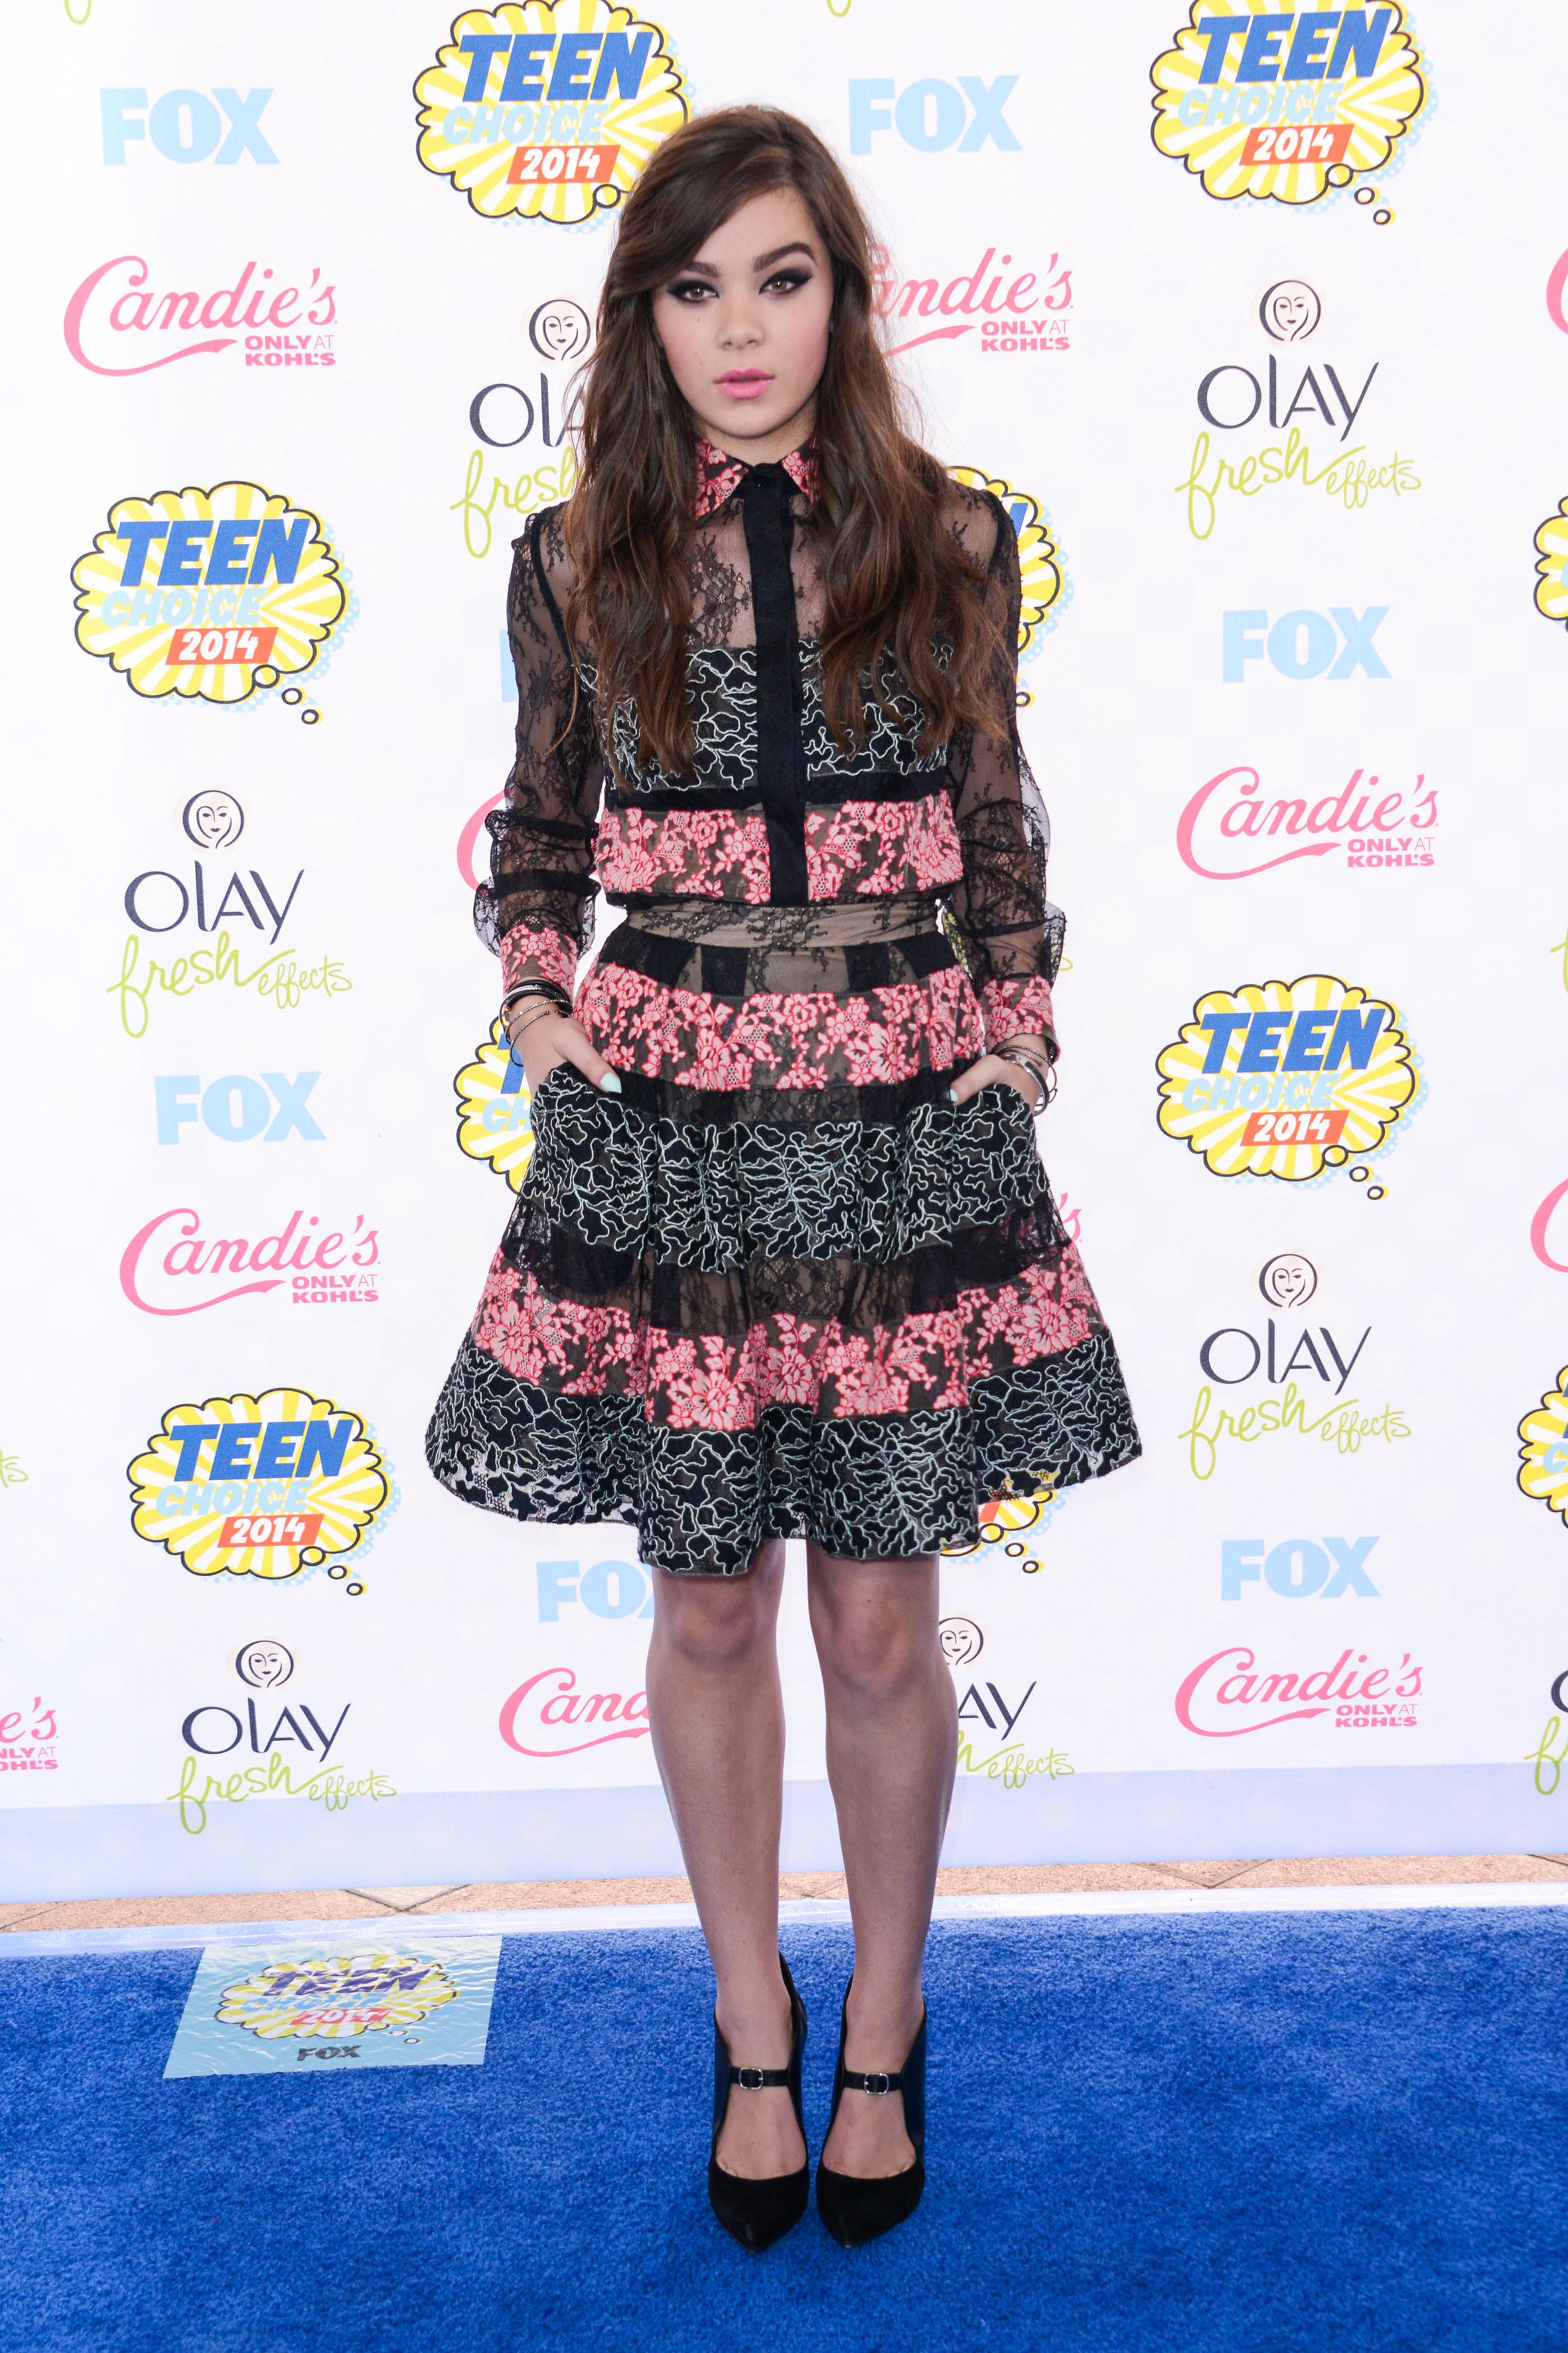 Stars attend the Teen Choice Awards **USA, Australia, New Zealand ONLY**